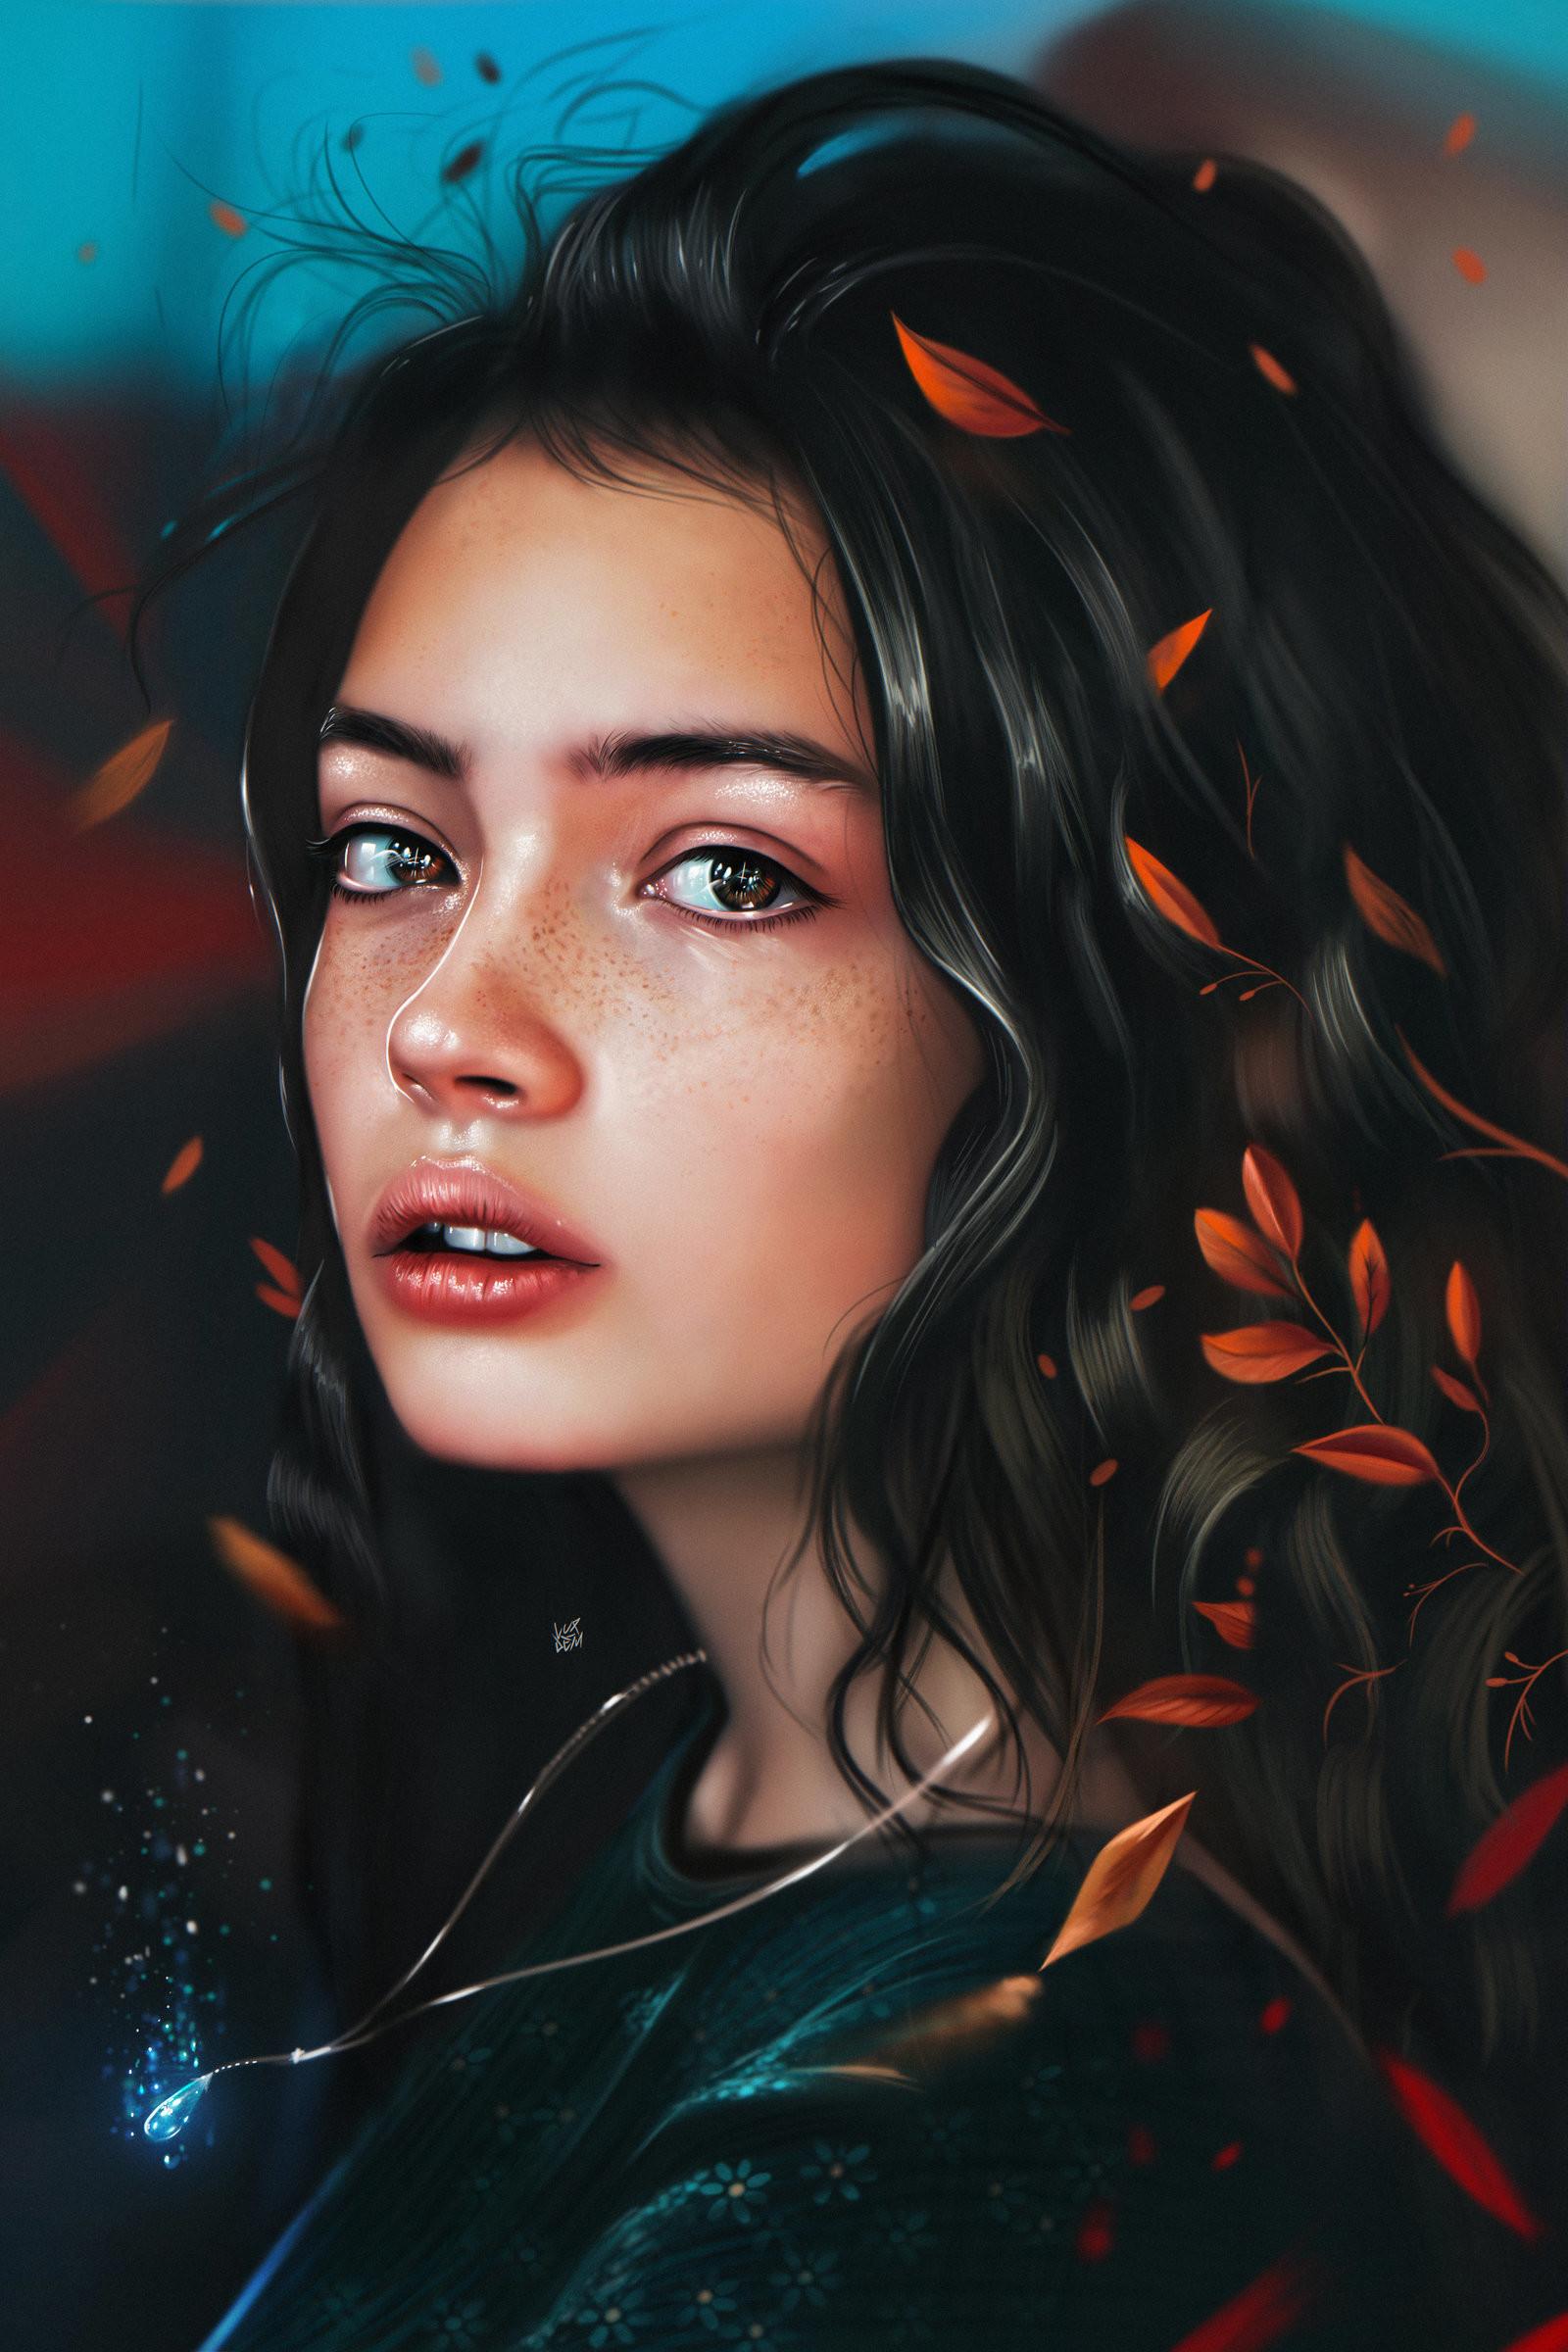 Yasar vurdem reborn illustration sasha kichigina by vurdem db9t4xw